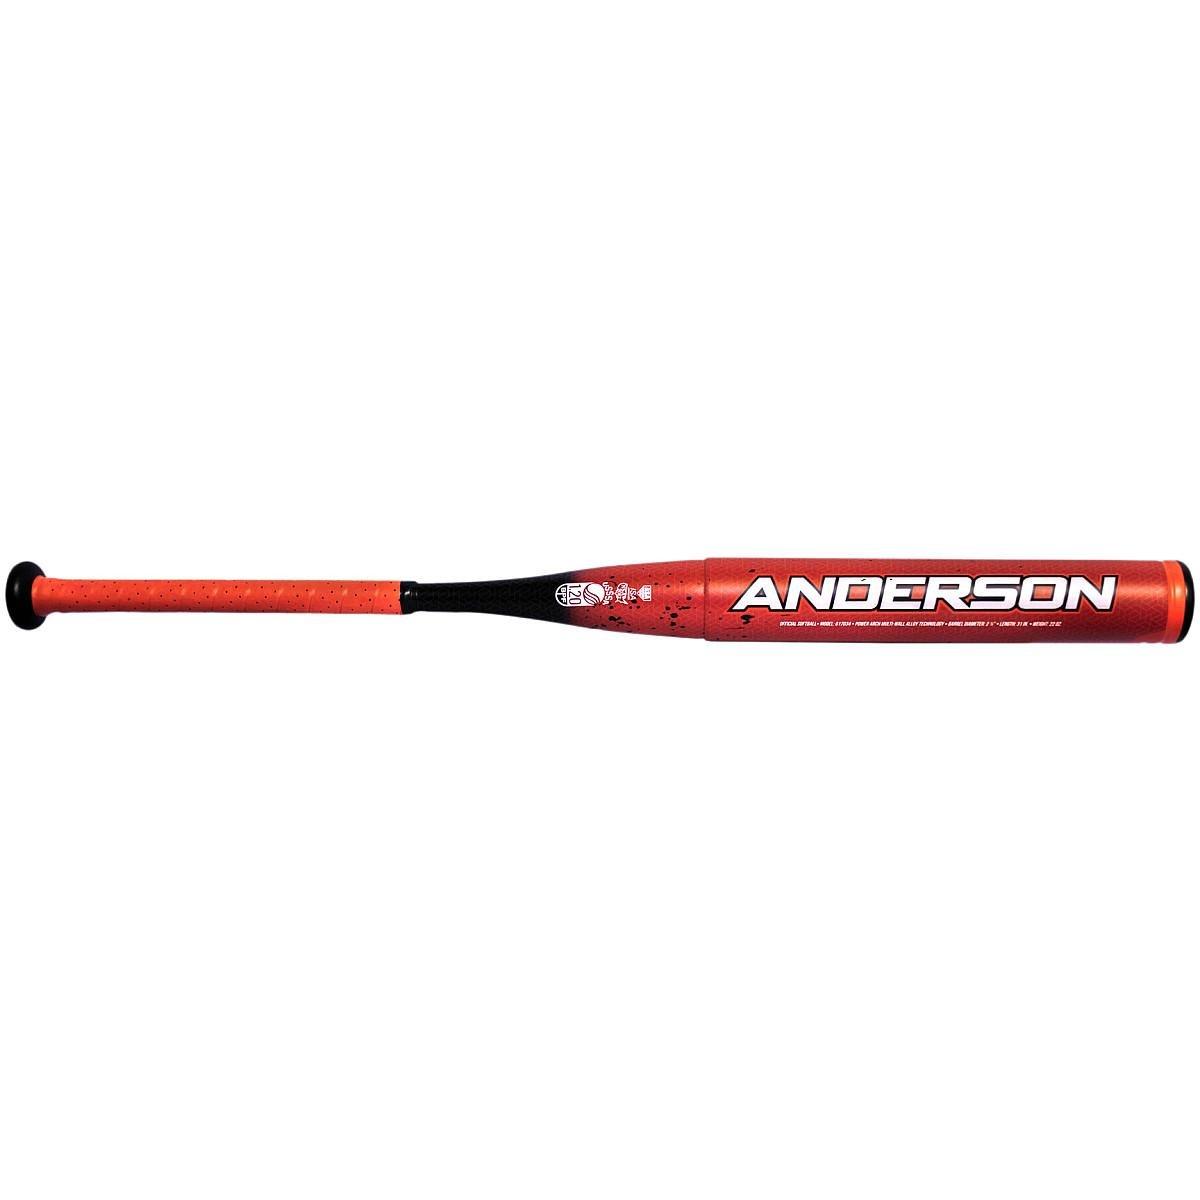 2018 Anderson RockeTech (- 9 ) Fastpitch Softball Bat B076CQ5BLN 31 Inch / 22 oz.